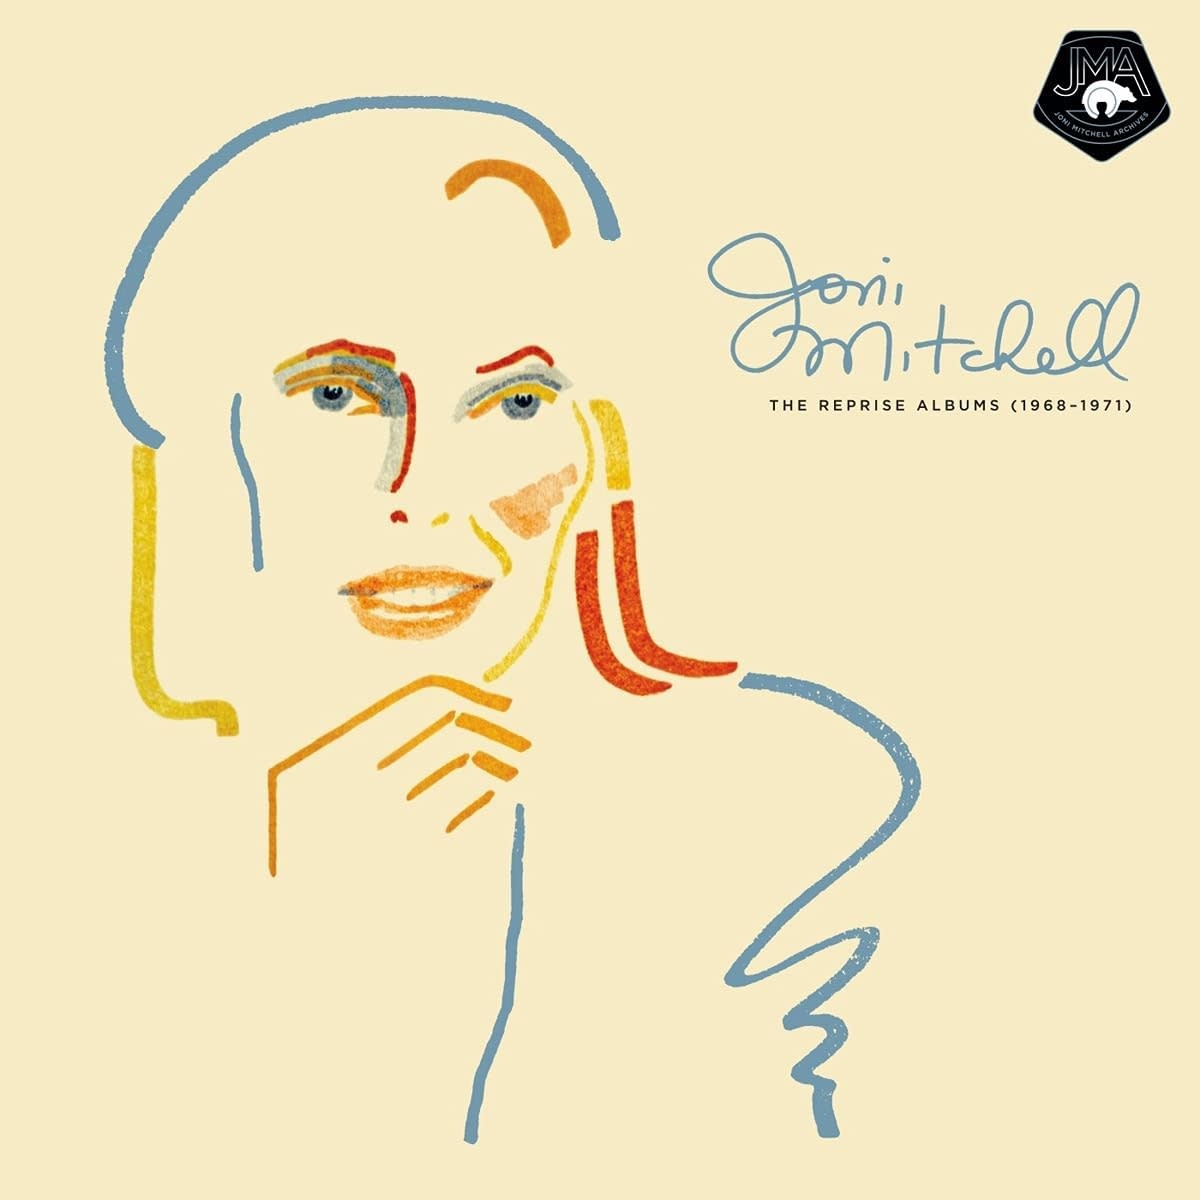 Rock/Pop Joni Mitchell - The Reprise Albums (1968-1971) (4LP 180g) (Price Reduced: minor corner dent)